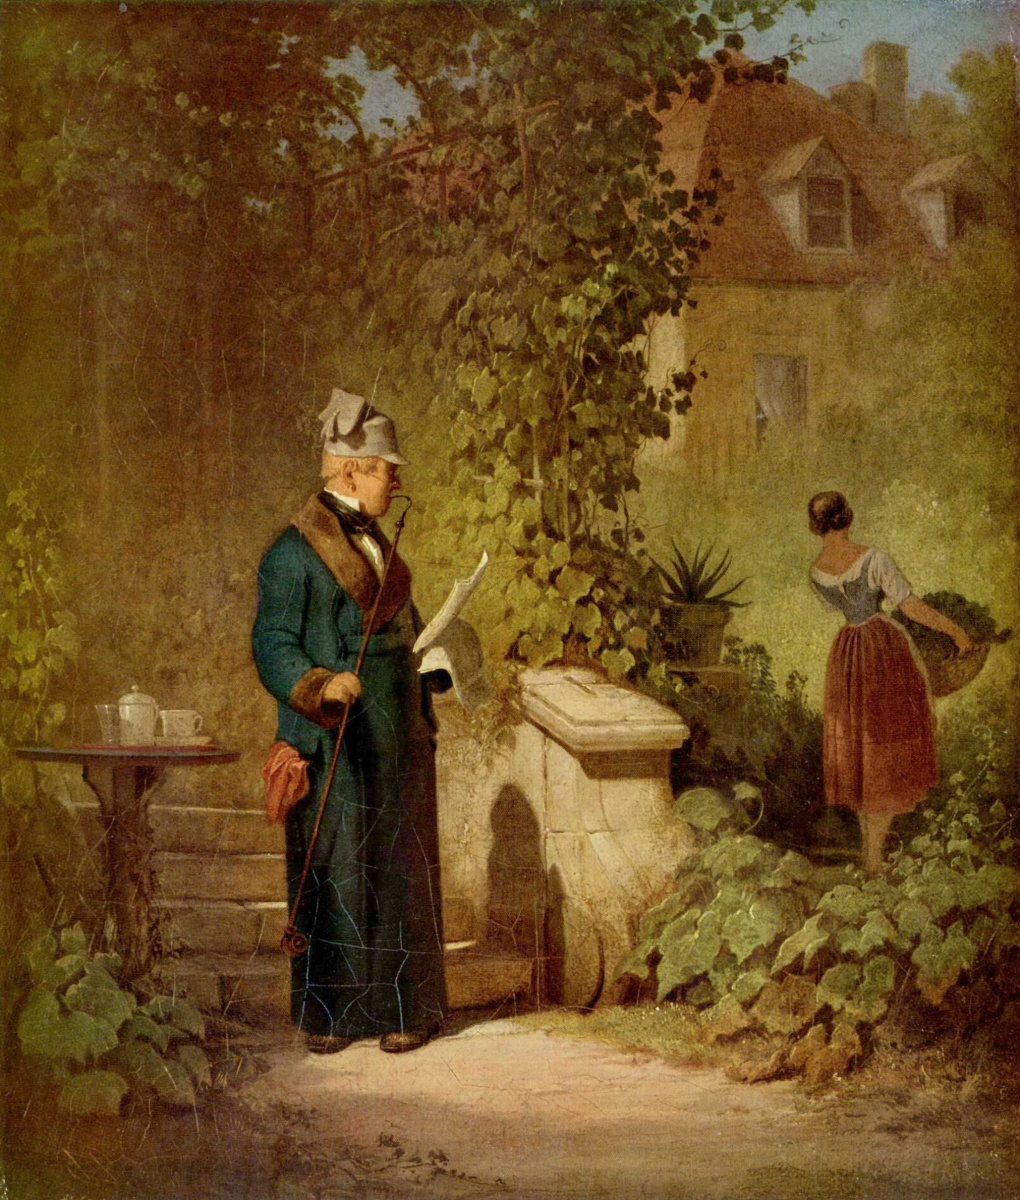 Karl Spitzweg. Reading the newspaper in the garden